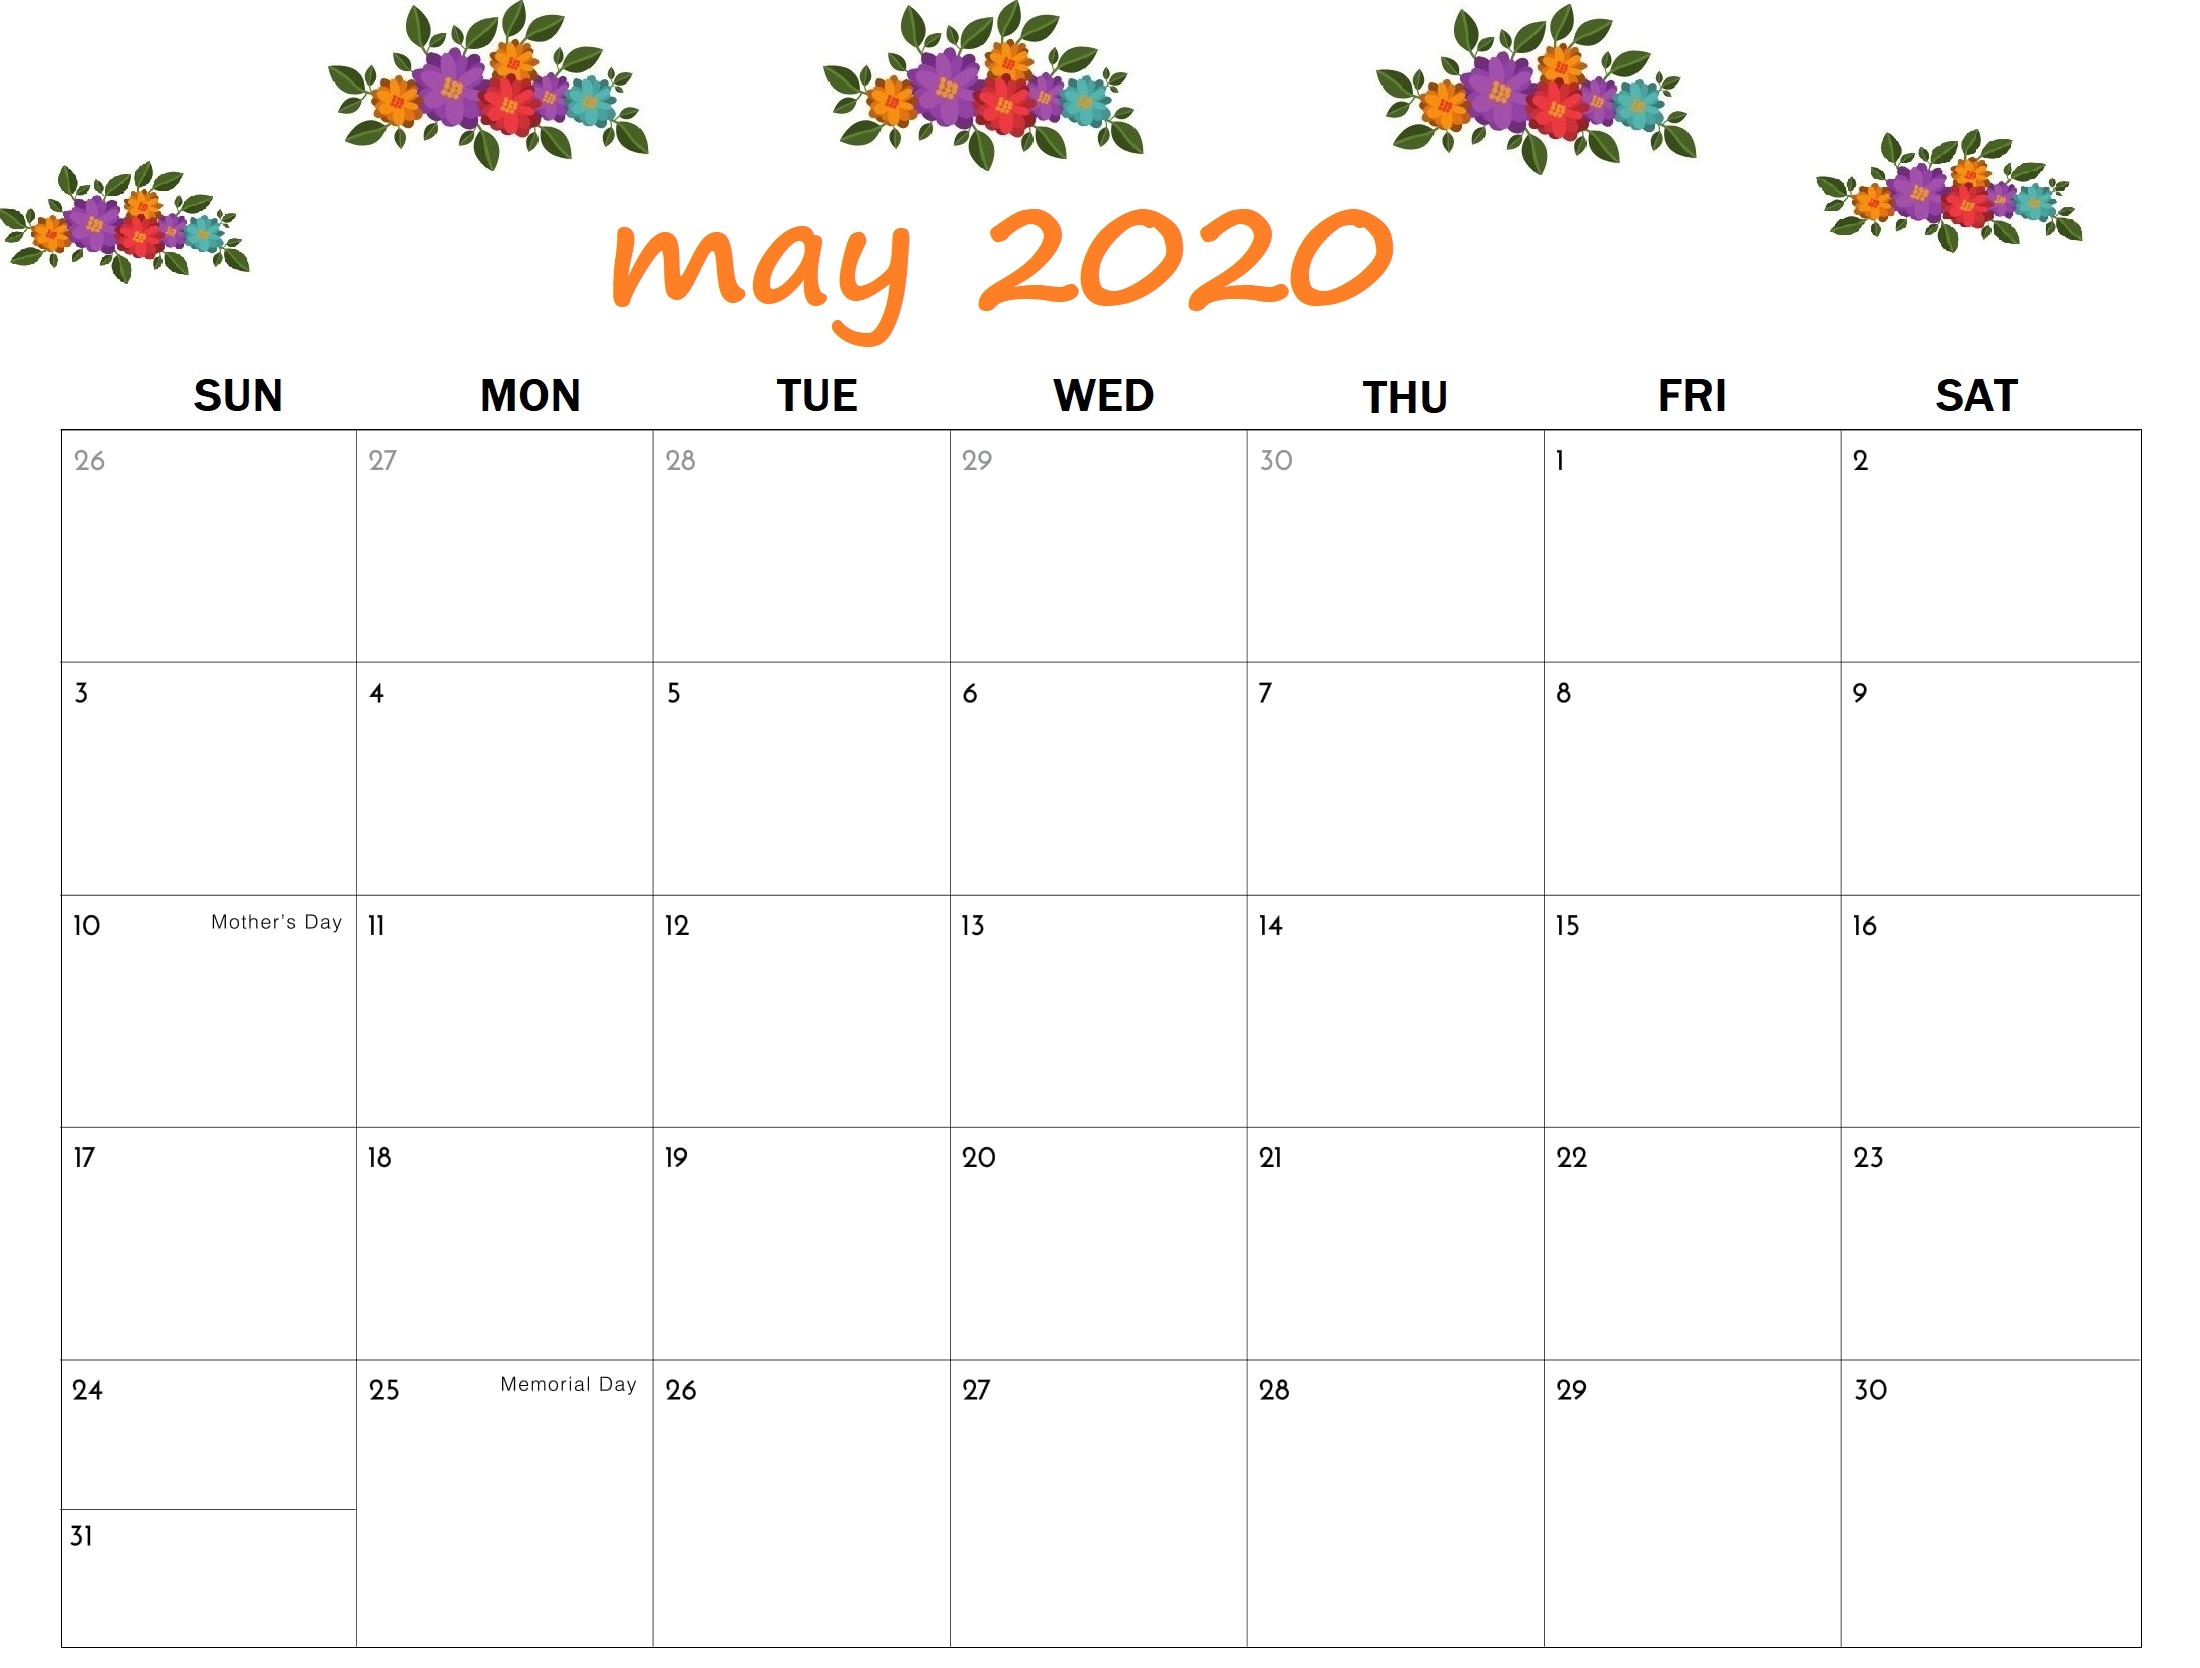 May 2020 Wallpaper Calendar